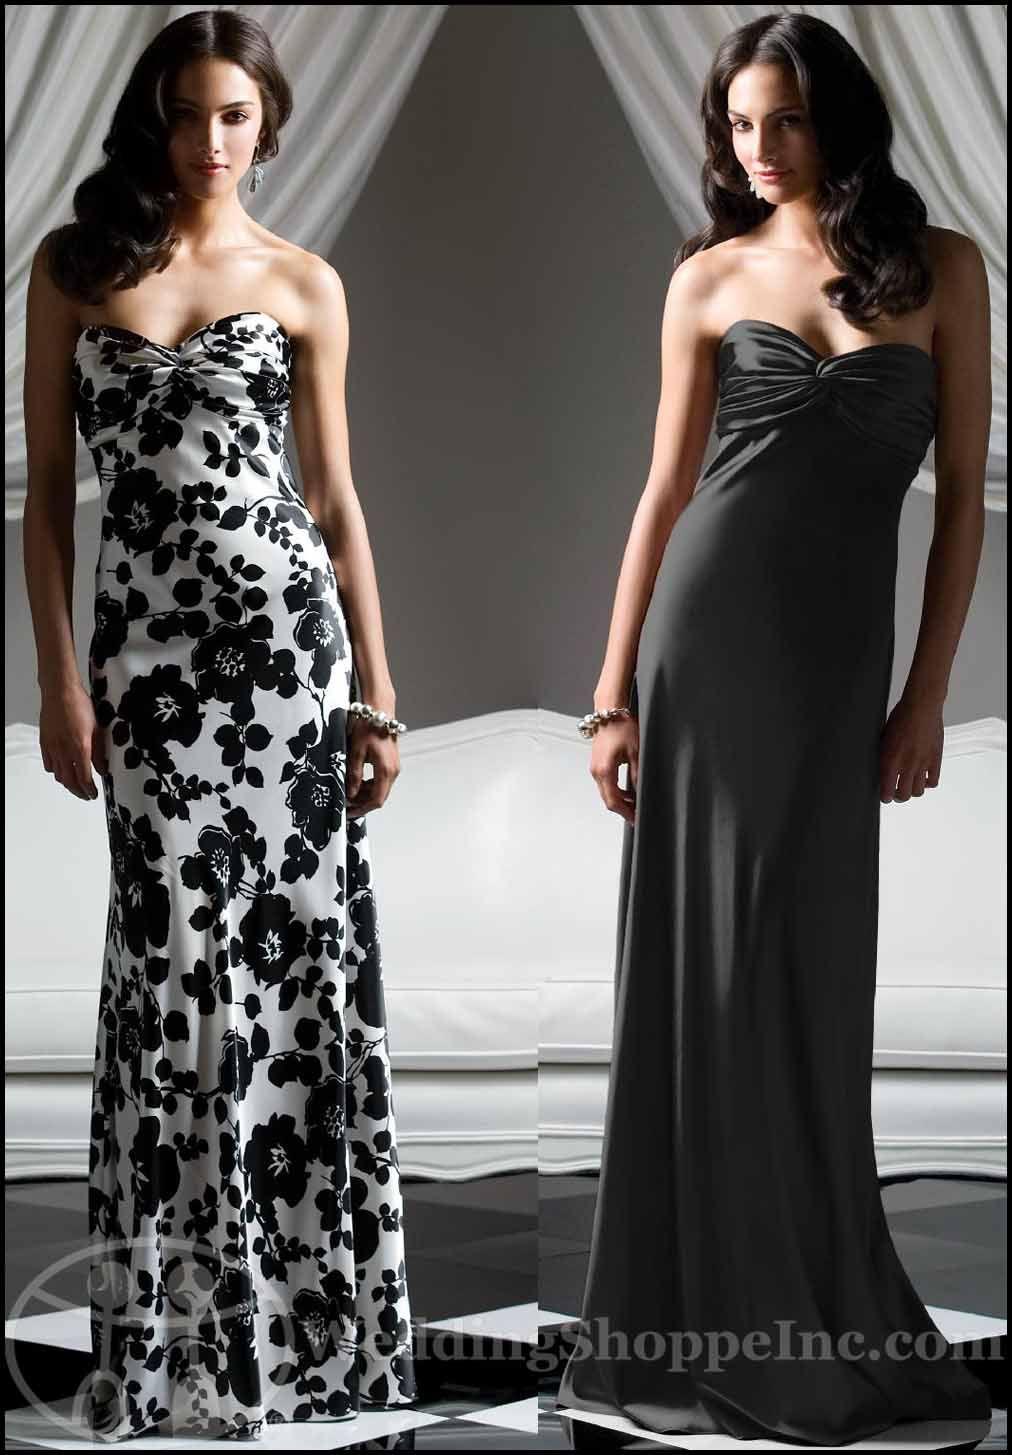 Black and white bridesmaid dresses dessy 2756left dress would black and white bridesmaid dresses dessy 2756left dress would be a ombrellifo Images